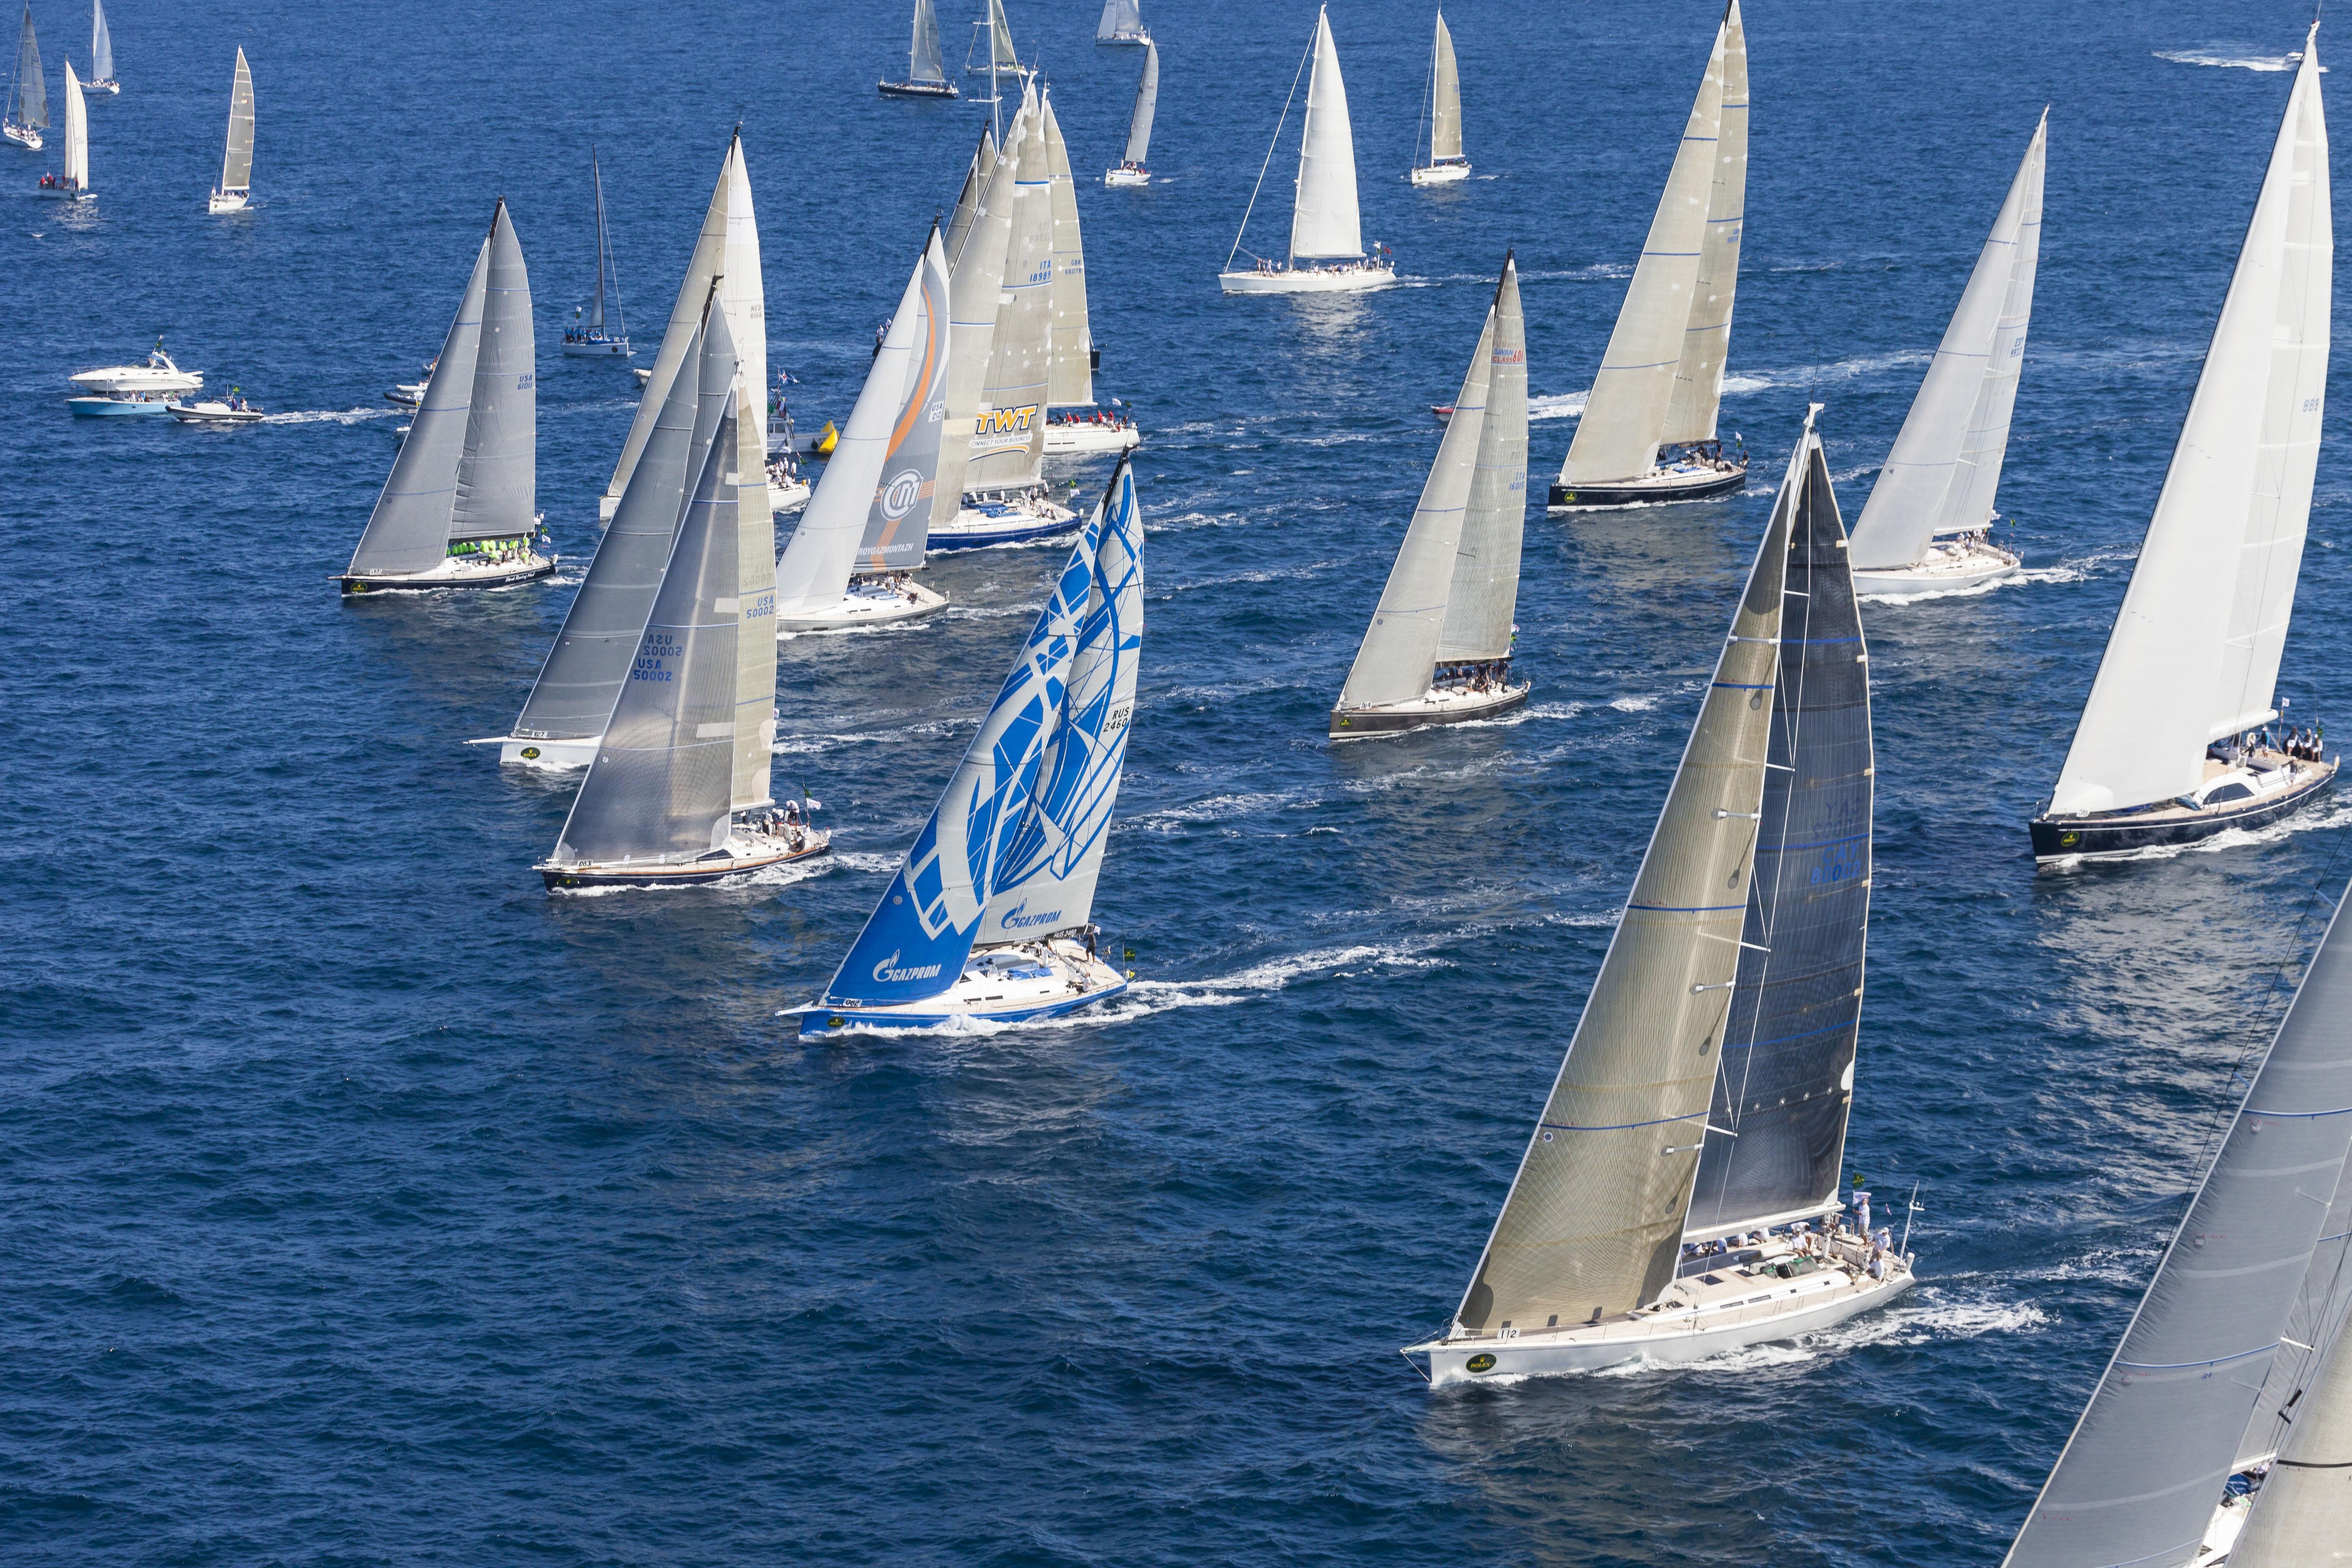 Swan 60 Bronenosec racing in 2012  © Nautor's Swan/Alberto Cocchi